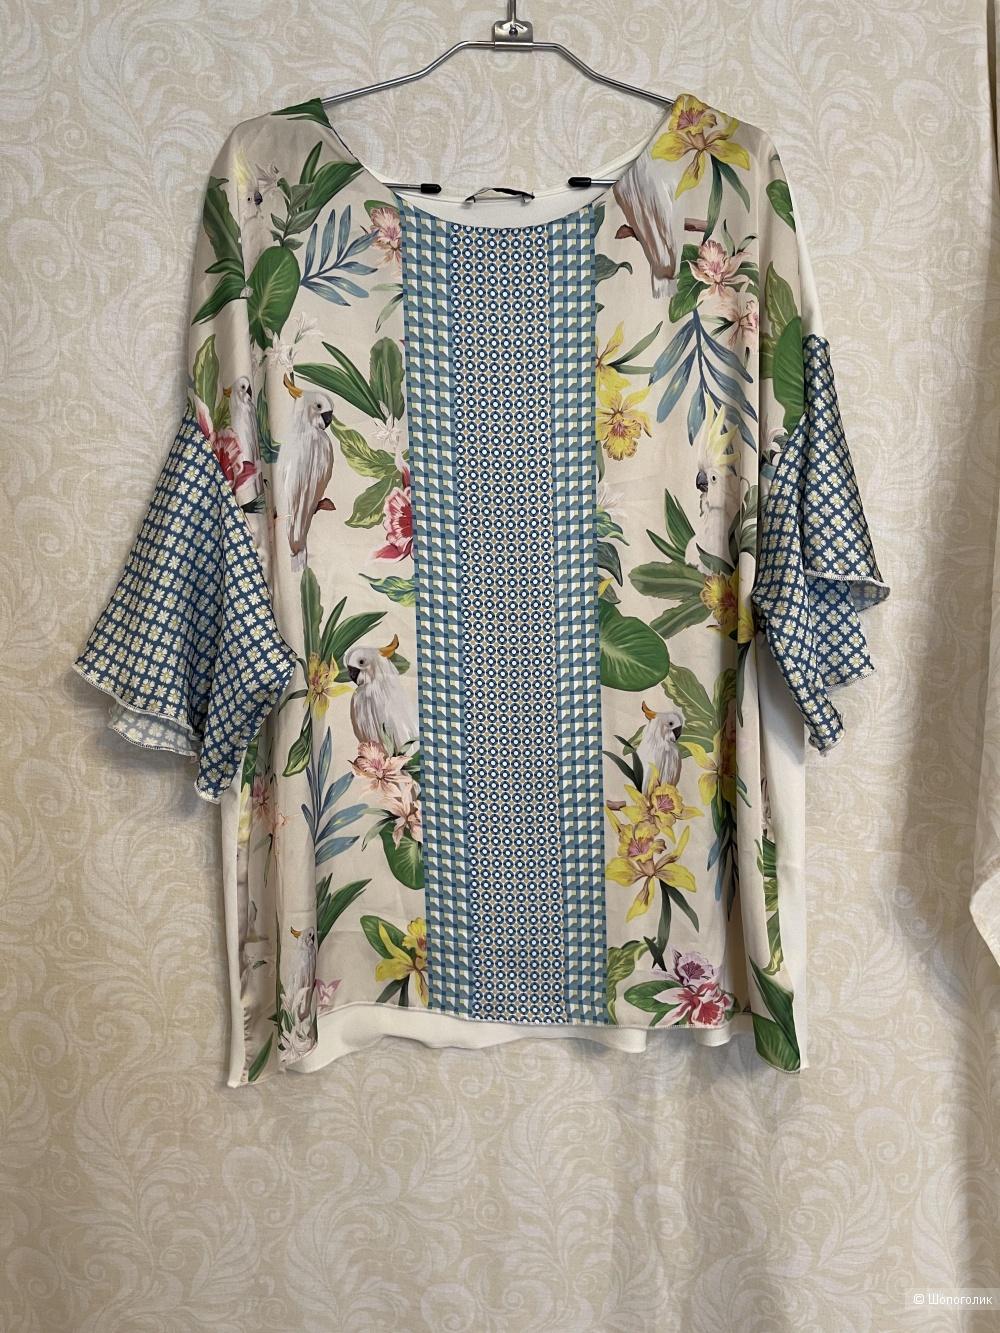 Блузка Zara размер 46/48